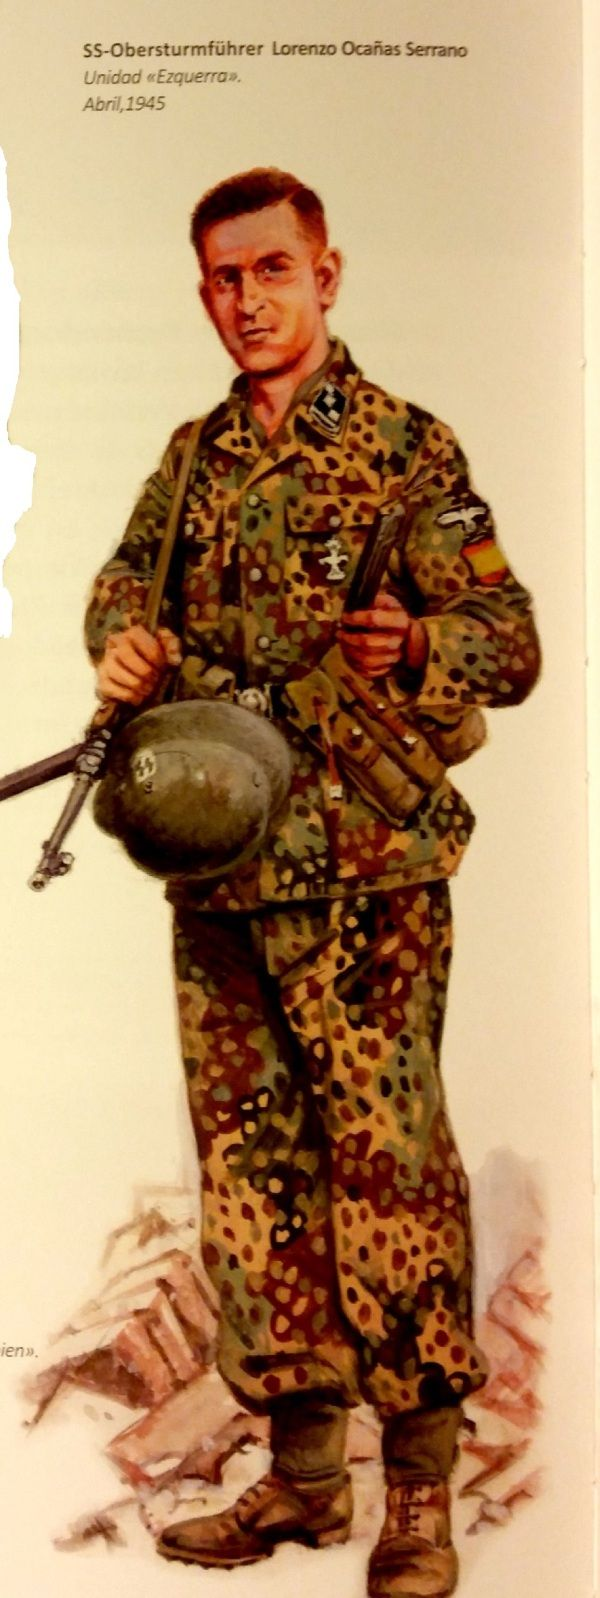 Spanish volunteer in Waffen SS, Berlin 1945, pin by Paolo Marzioli